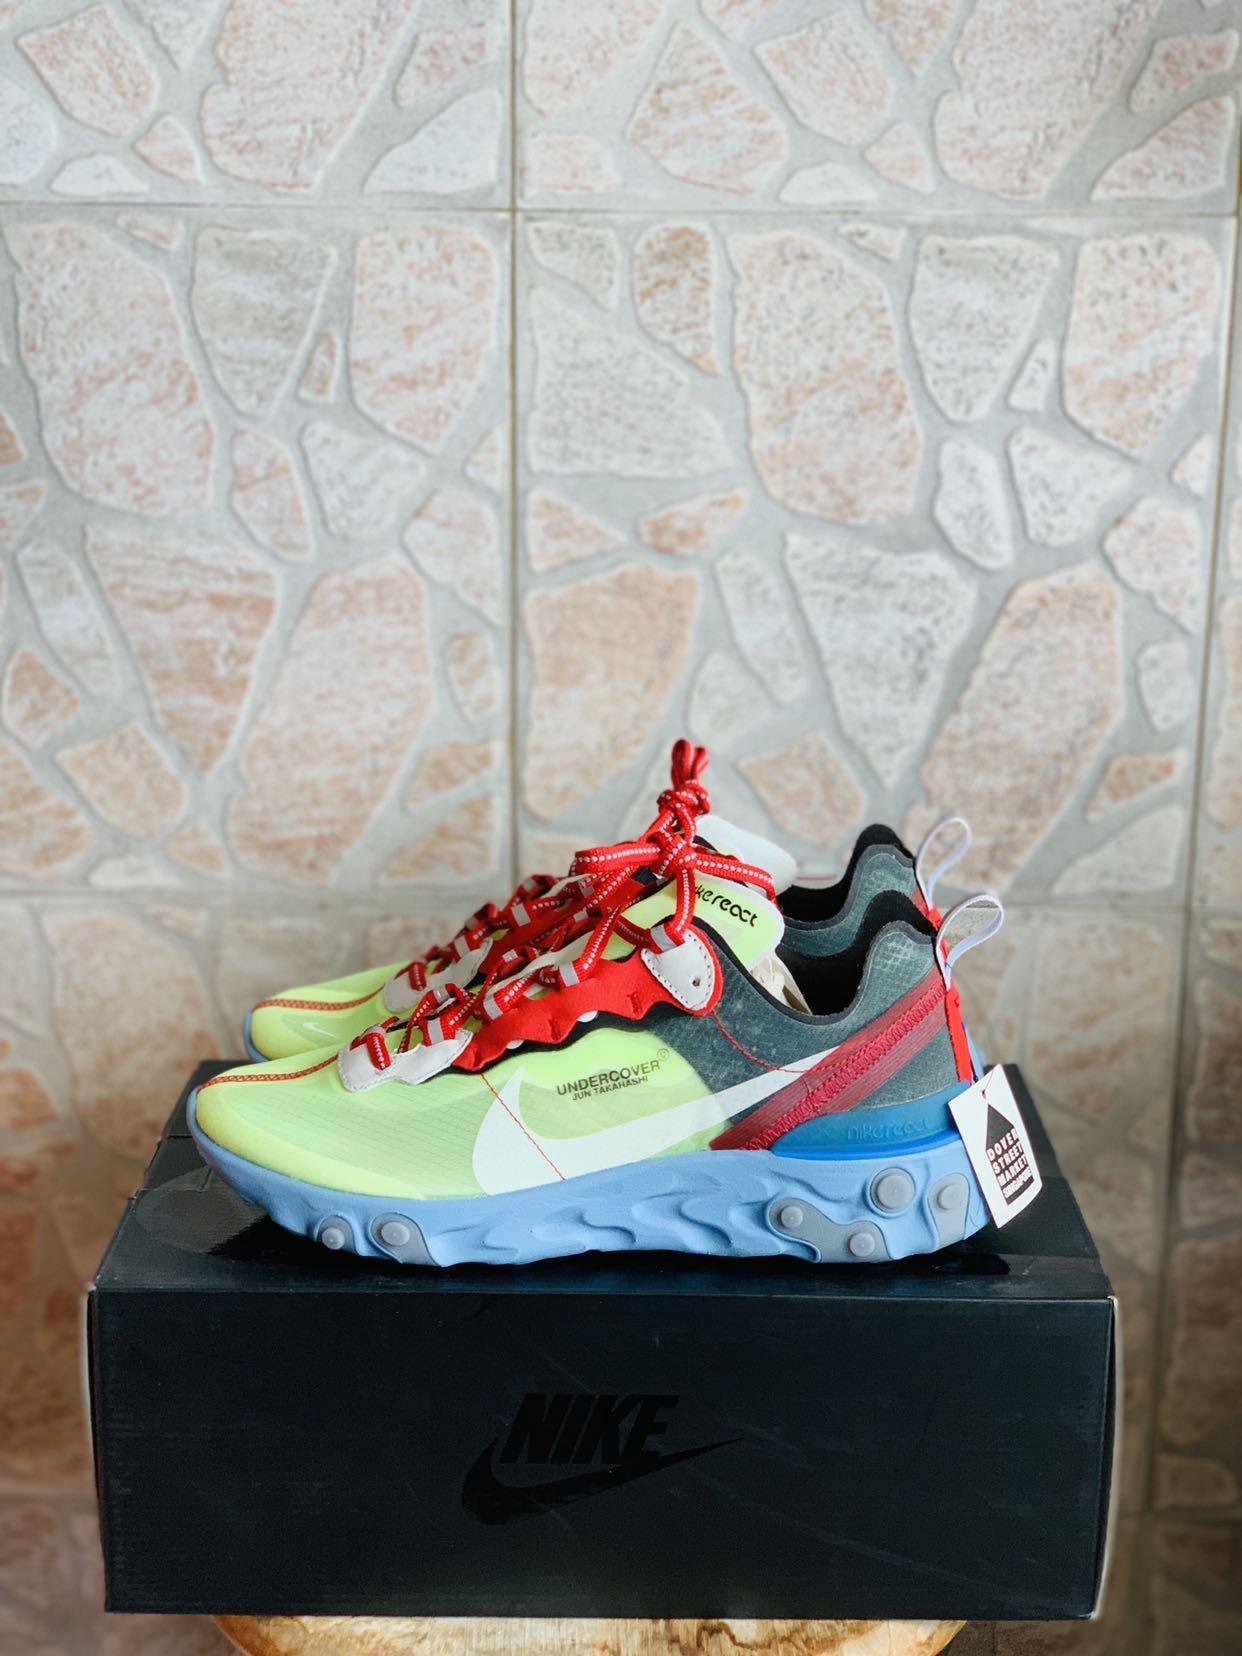 Nike React Element 87 Undercover x Jun